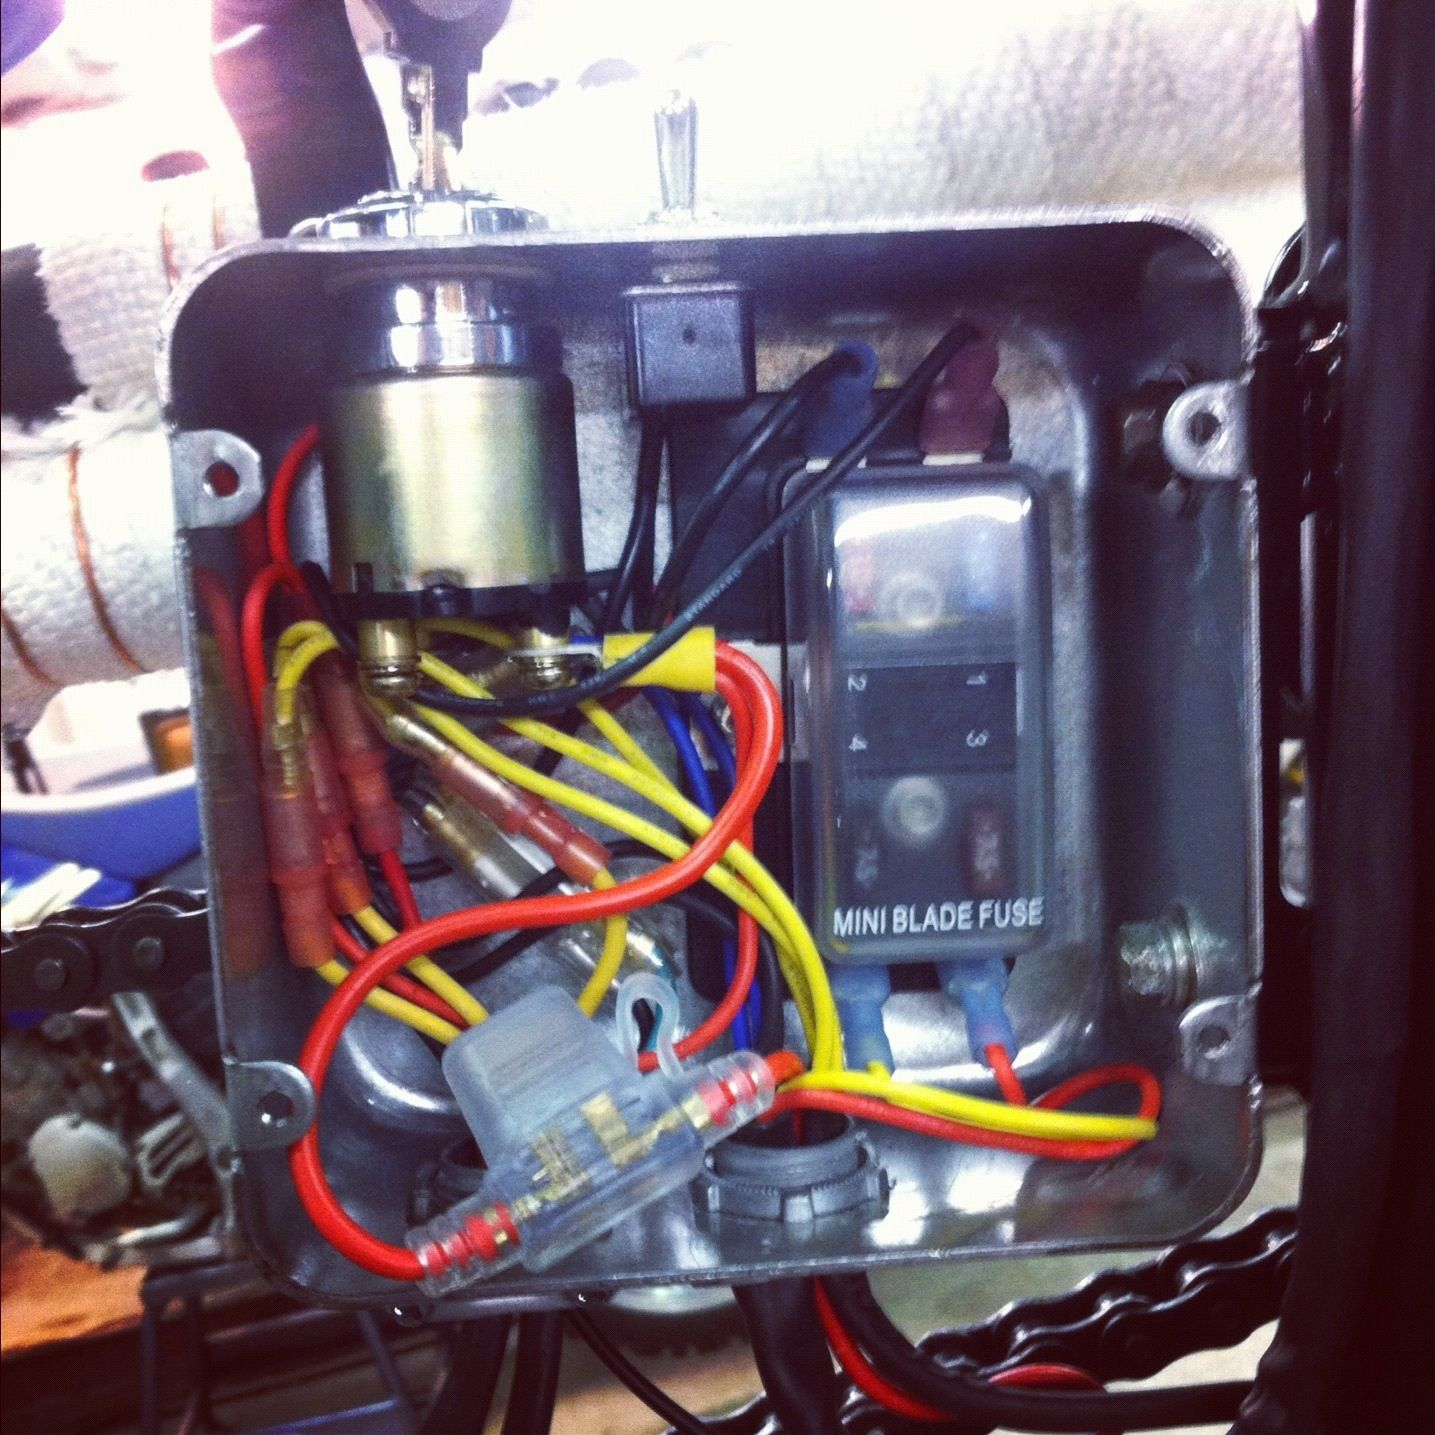 yamaha xs650 bobber wiring diagram solar panel for rv 10 electronics box motorcycles pinterest